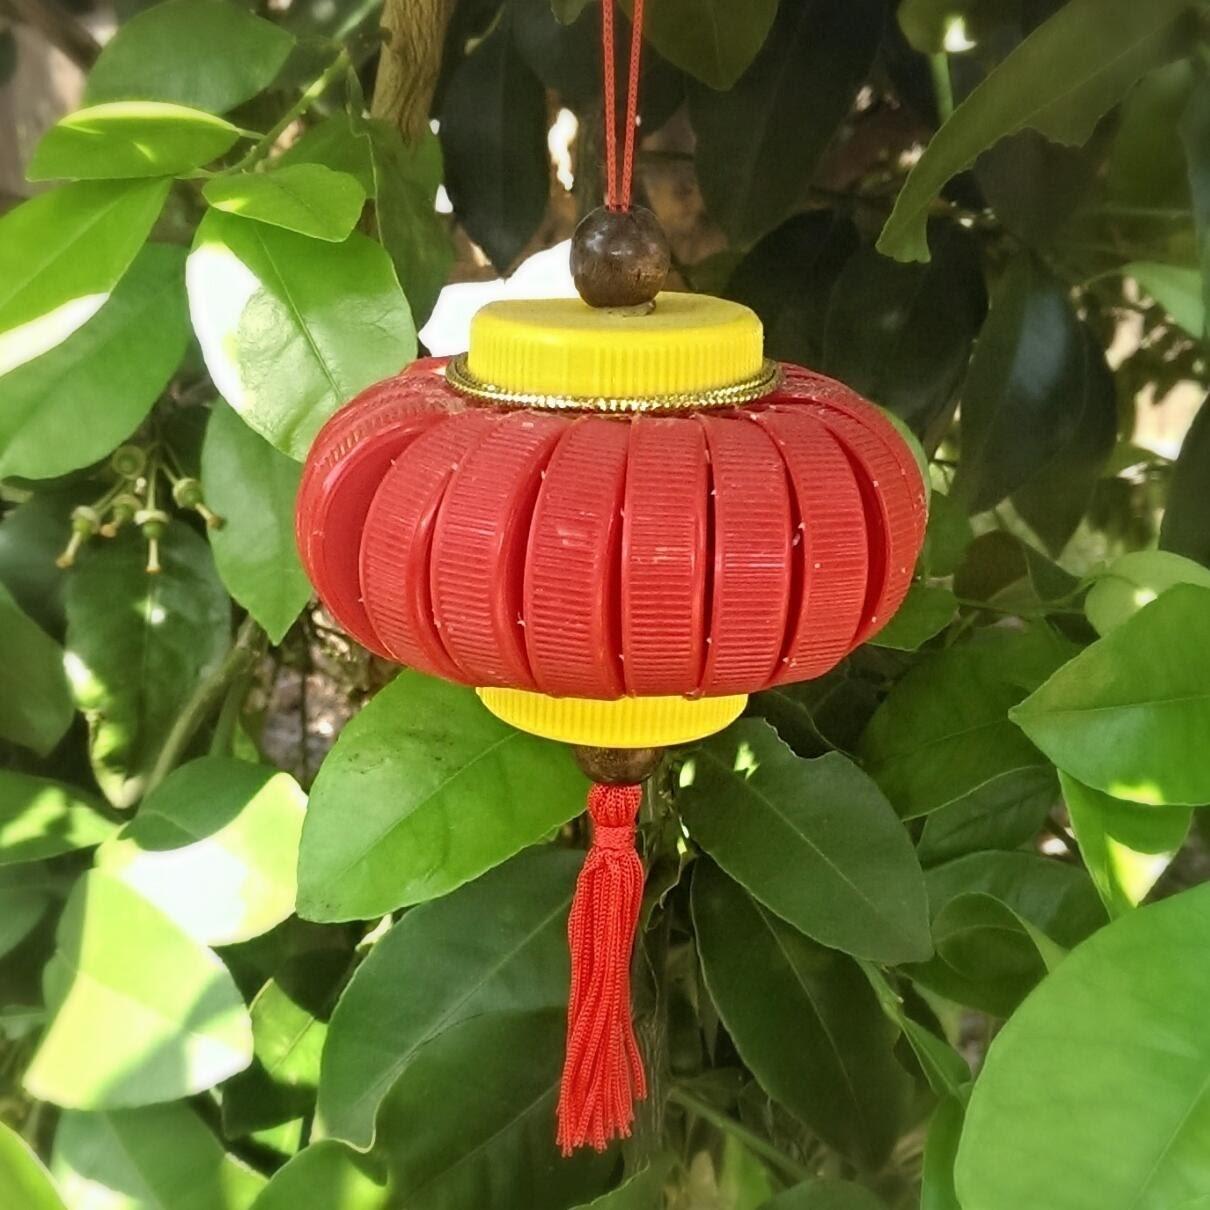 Recycled bottle cap lantern